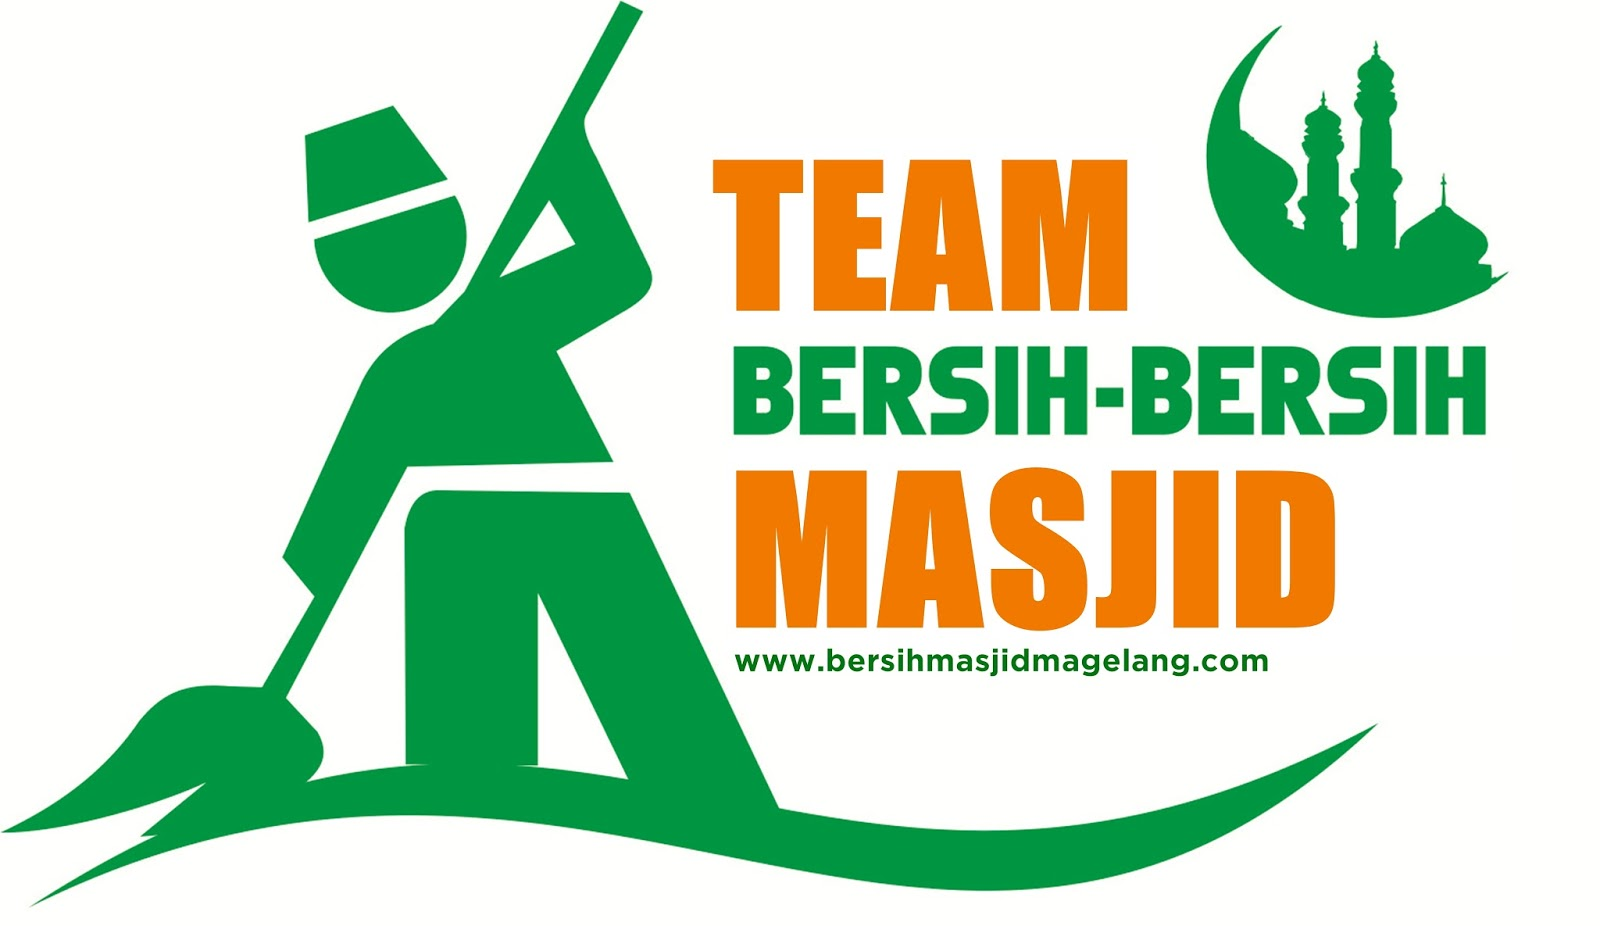 Bersih-bersih Masjid Magelang